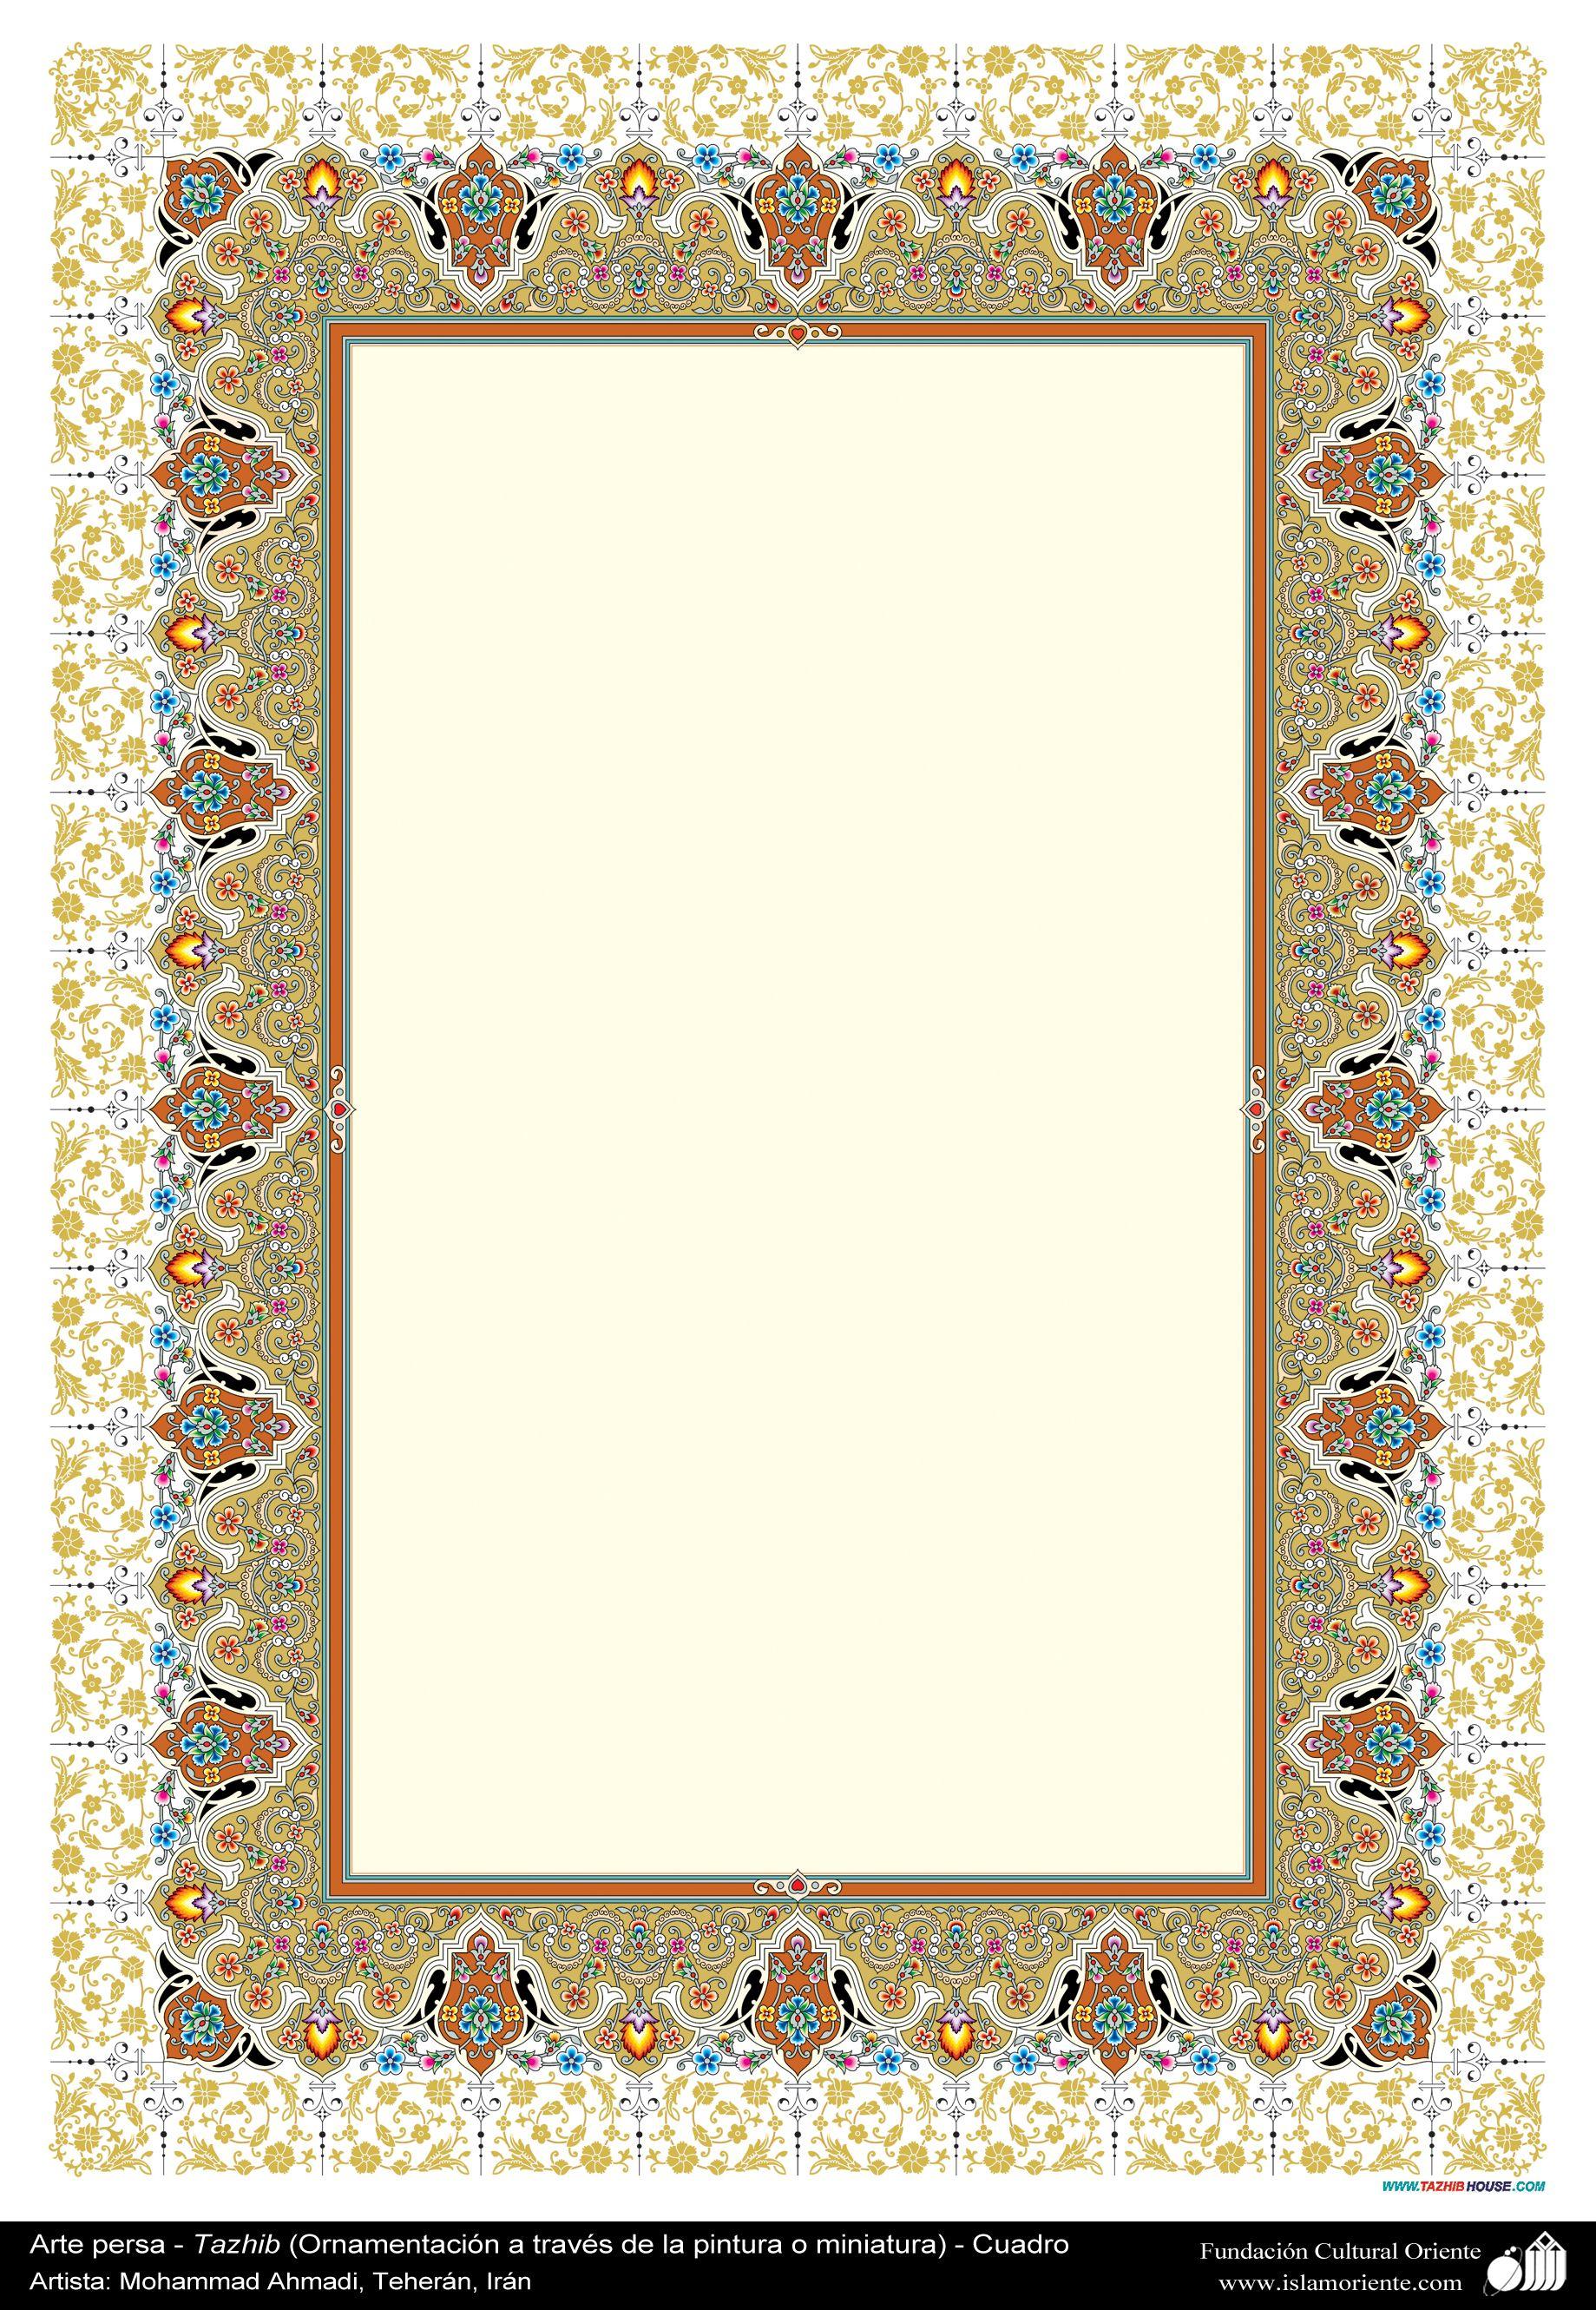 "<p><a href=""http://fotografia.islamoriente.com/sites/default/files/image_field/Arte_persa_-_Tazhib_%28Ornamentaci%C3%B3n_a_trav%C3%A9s_de_la_pintura_o_miniatura%29_-_Cuadro_-_6_0_4.jpg"">Download Original</a></p>"